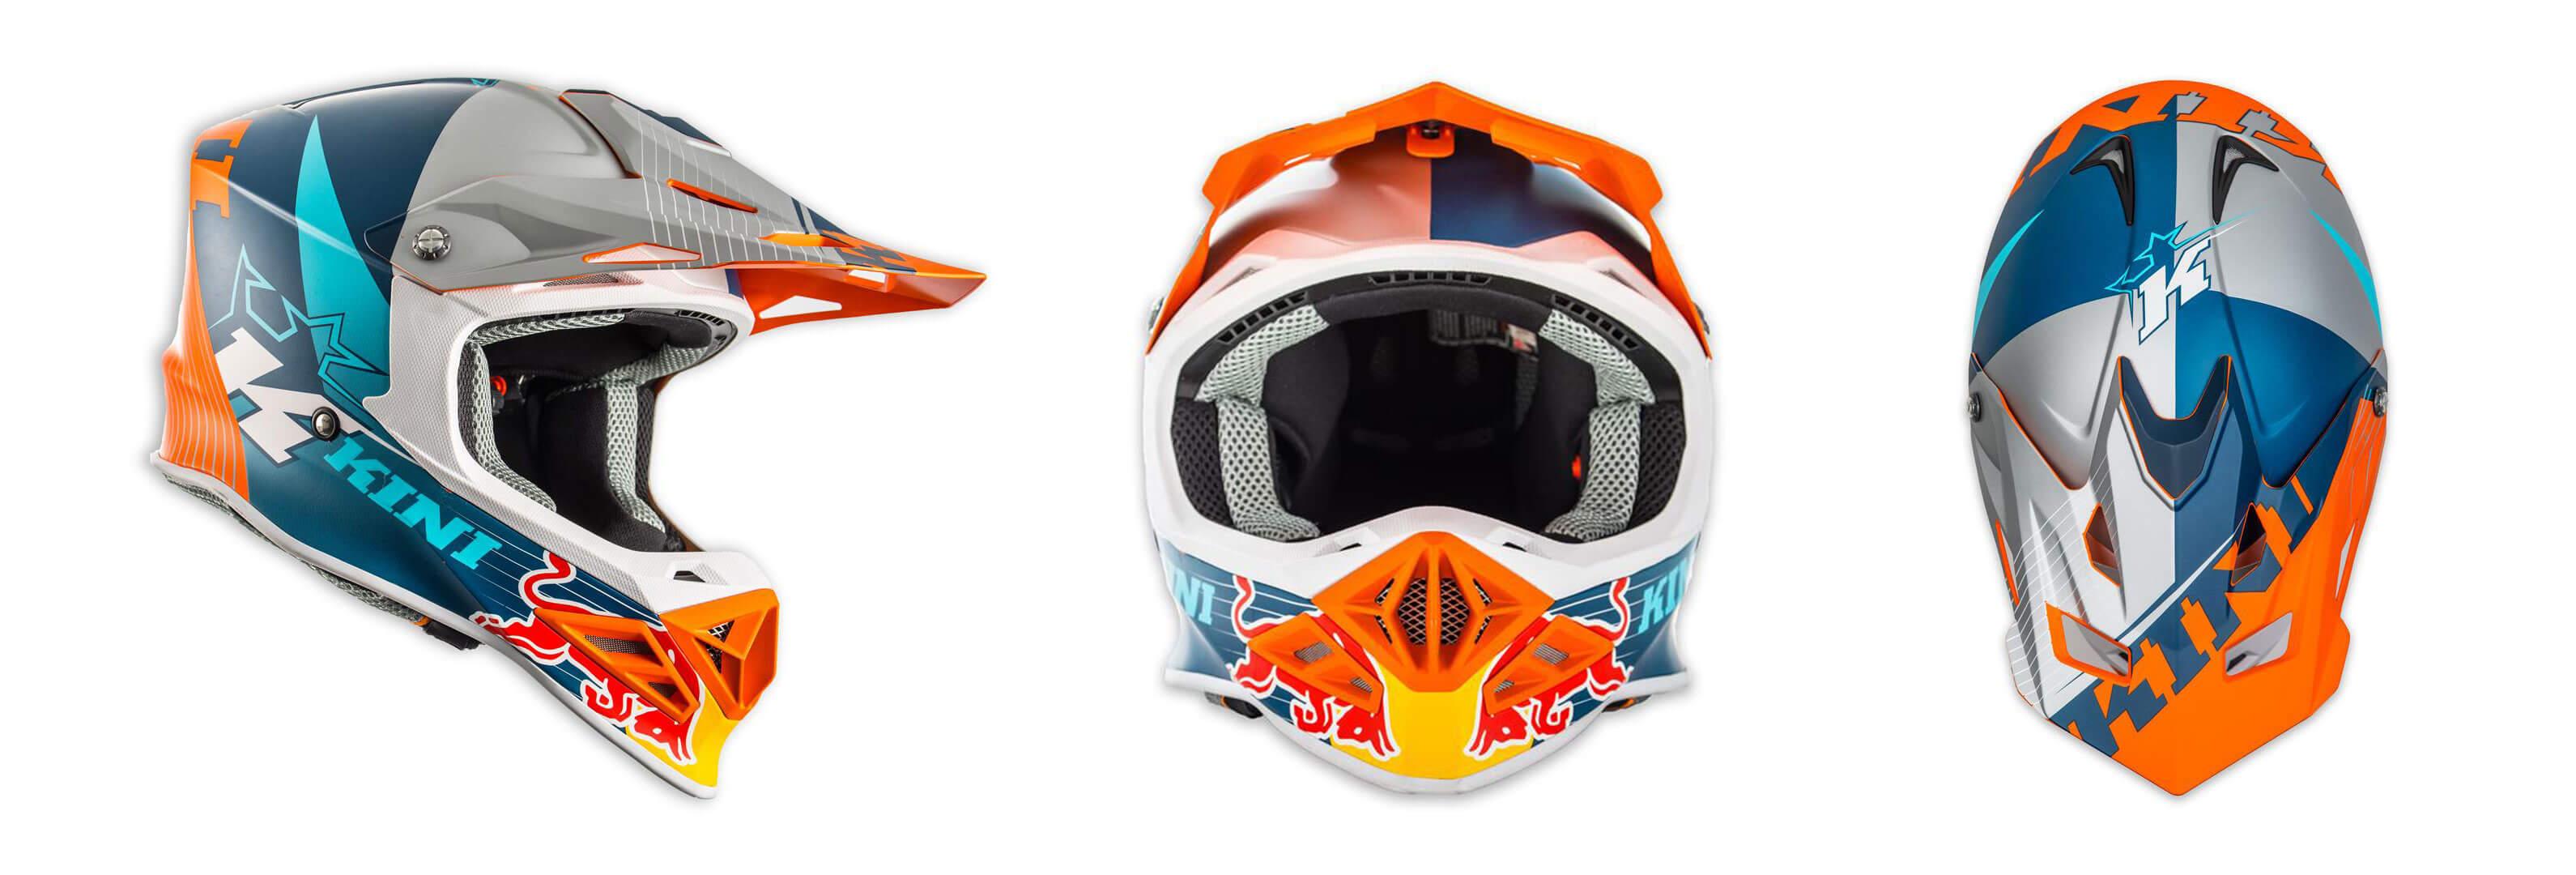 Was macht den Red Bull Motocross Helm so begehrenswert